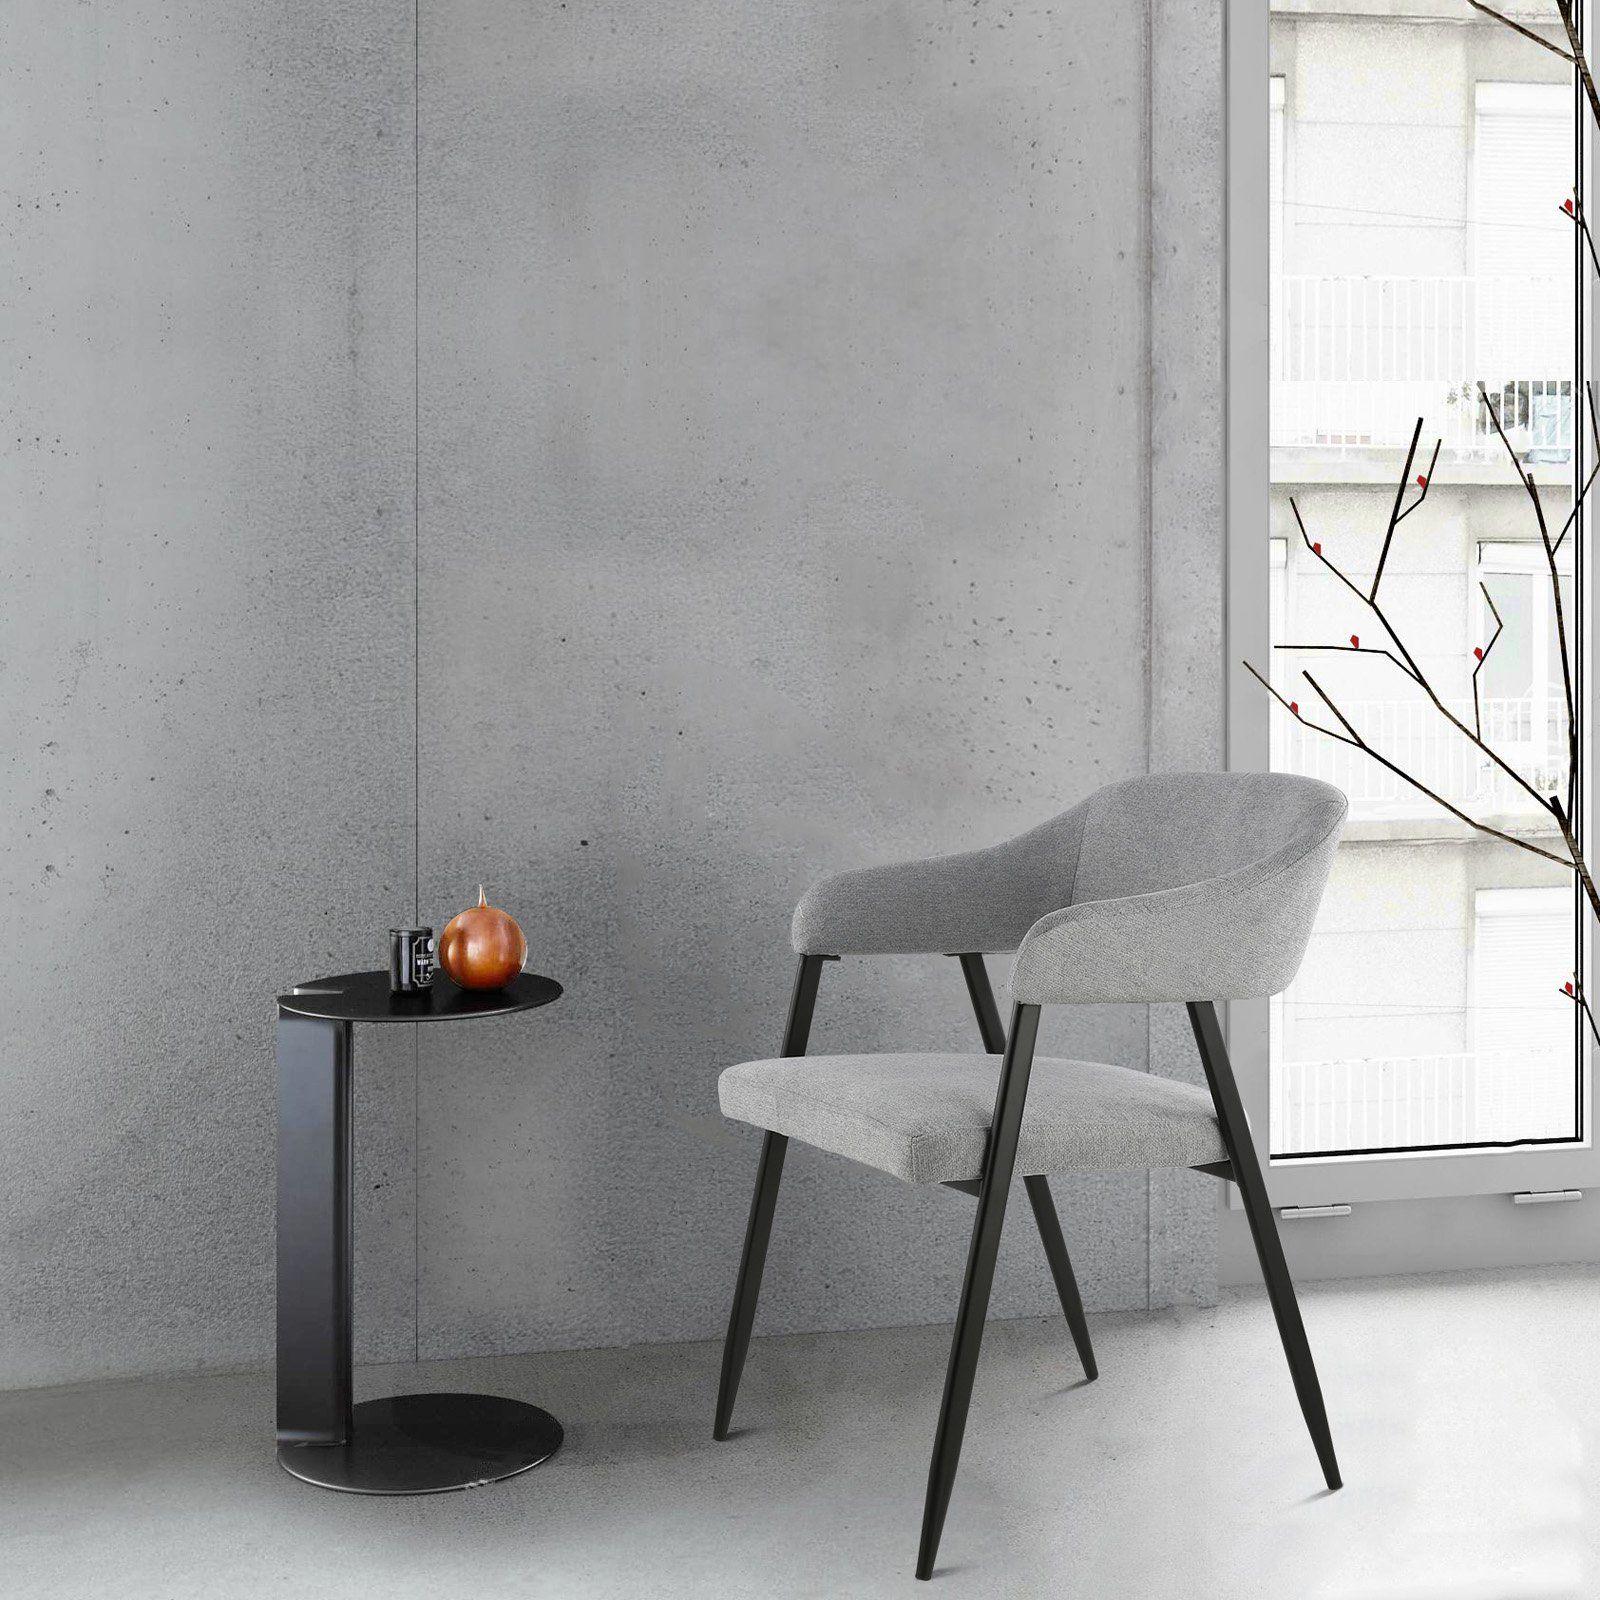 Edgemod Helsinki Upholstered Dining Arm Chair Set of 2